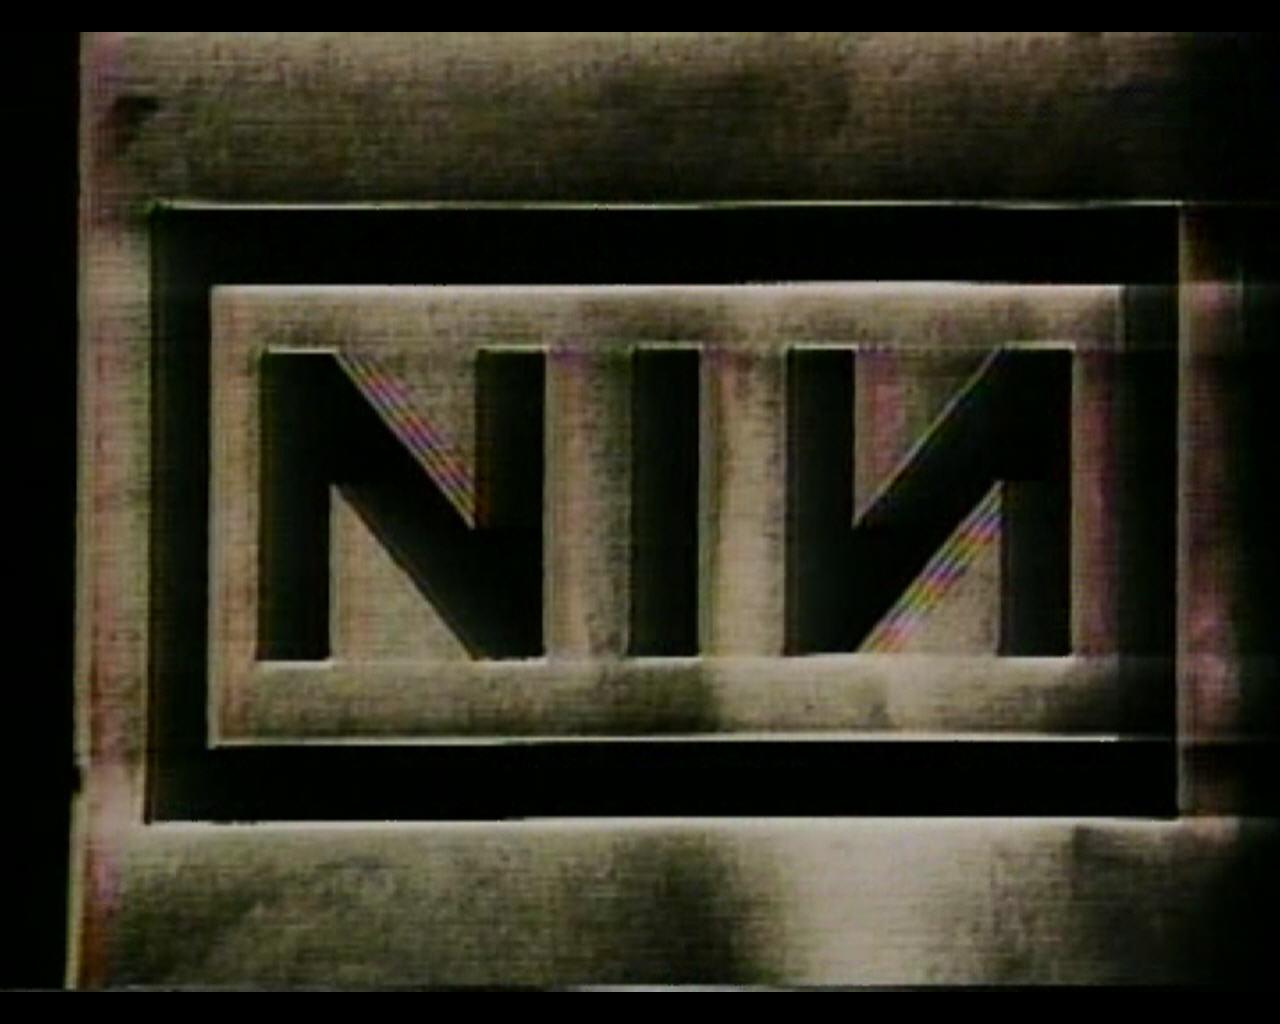 'The Definitive NIN: Heavy'